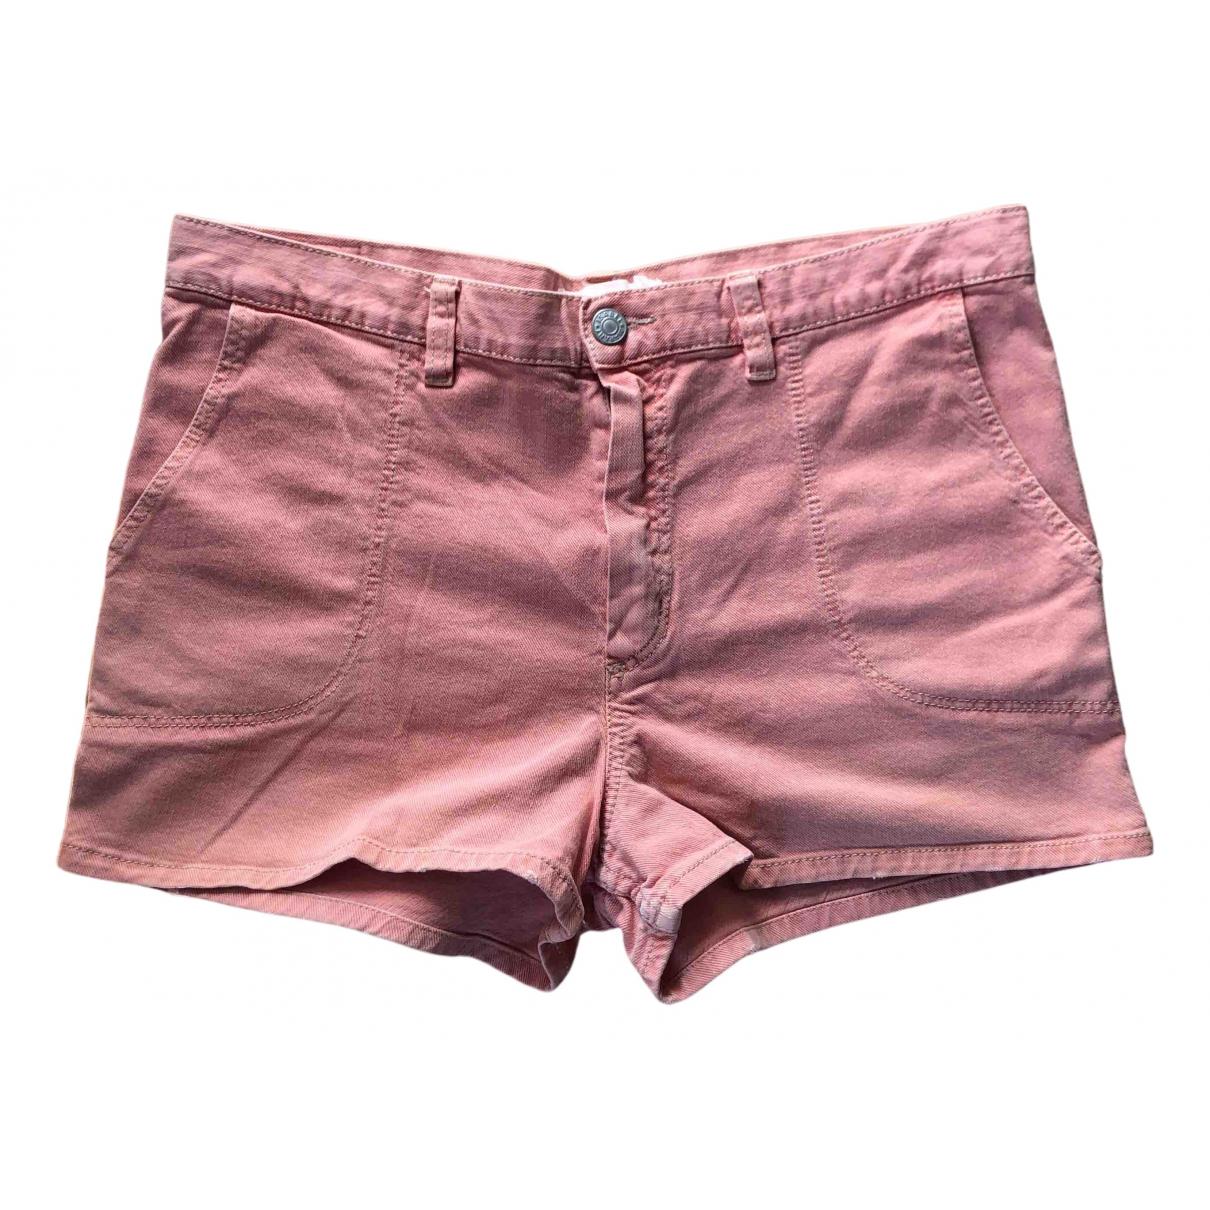 Isabel Marant Etoile N Pink Denim - Jeans Shorts for Women 38 FR